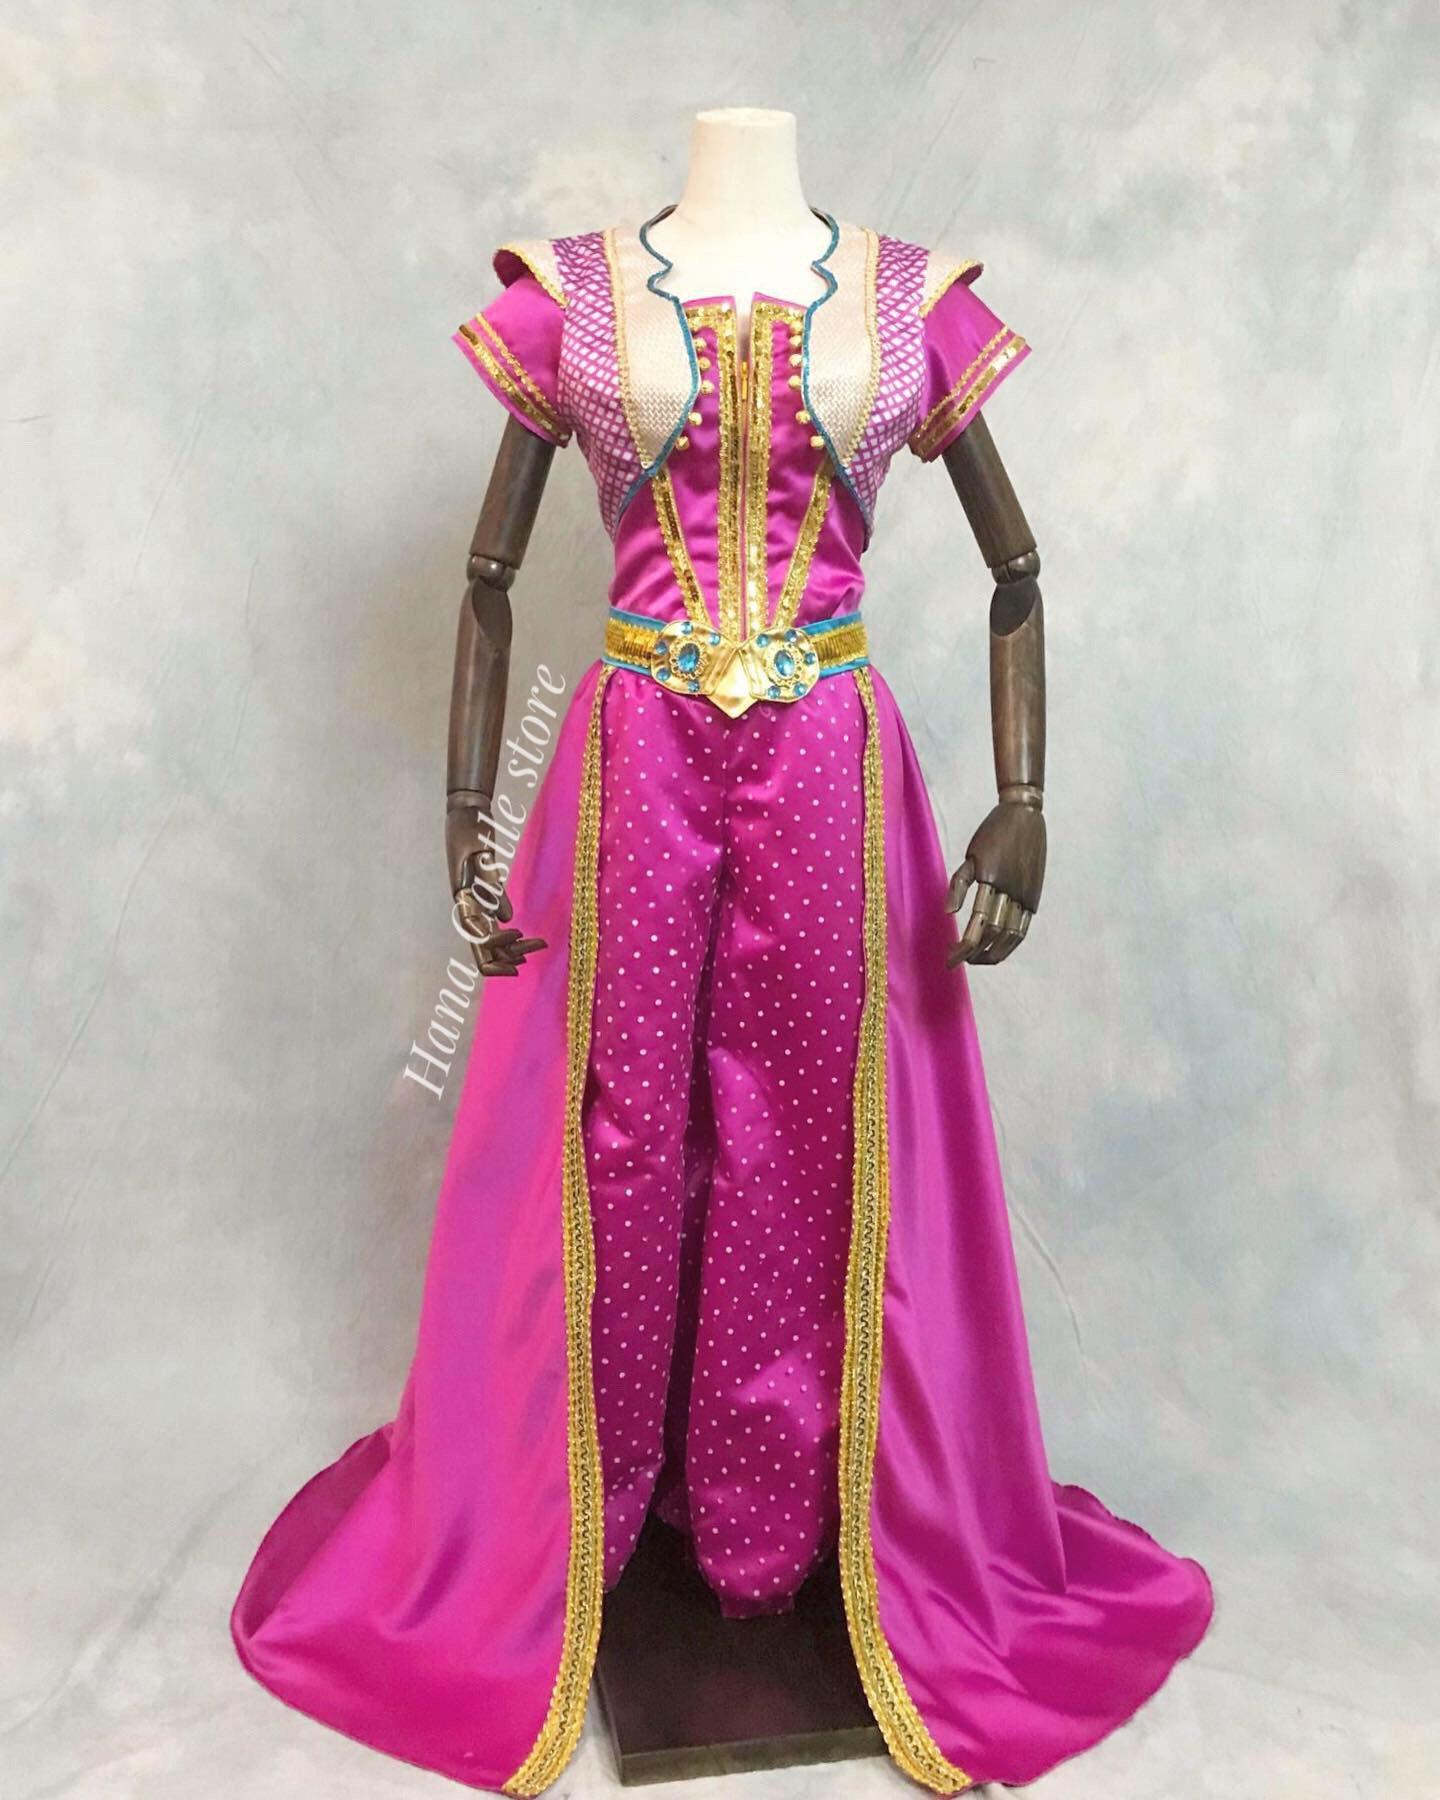 Disney Dreamy Collection Aladdin 2019 Live Action Princess Jasmine Pink Pant